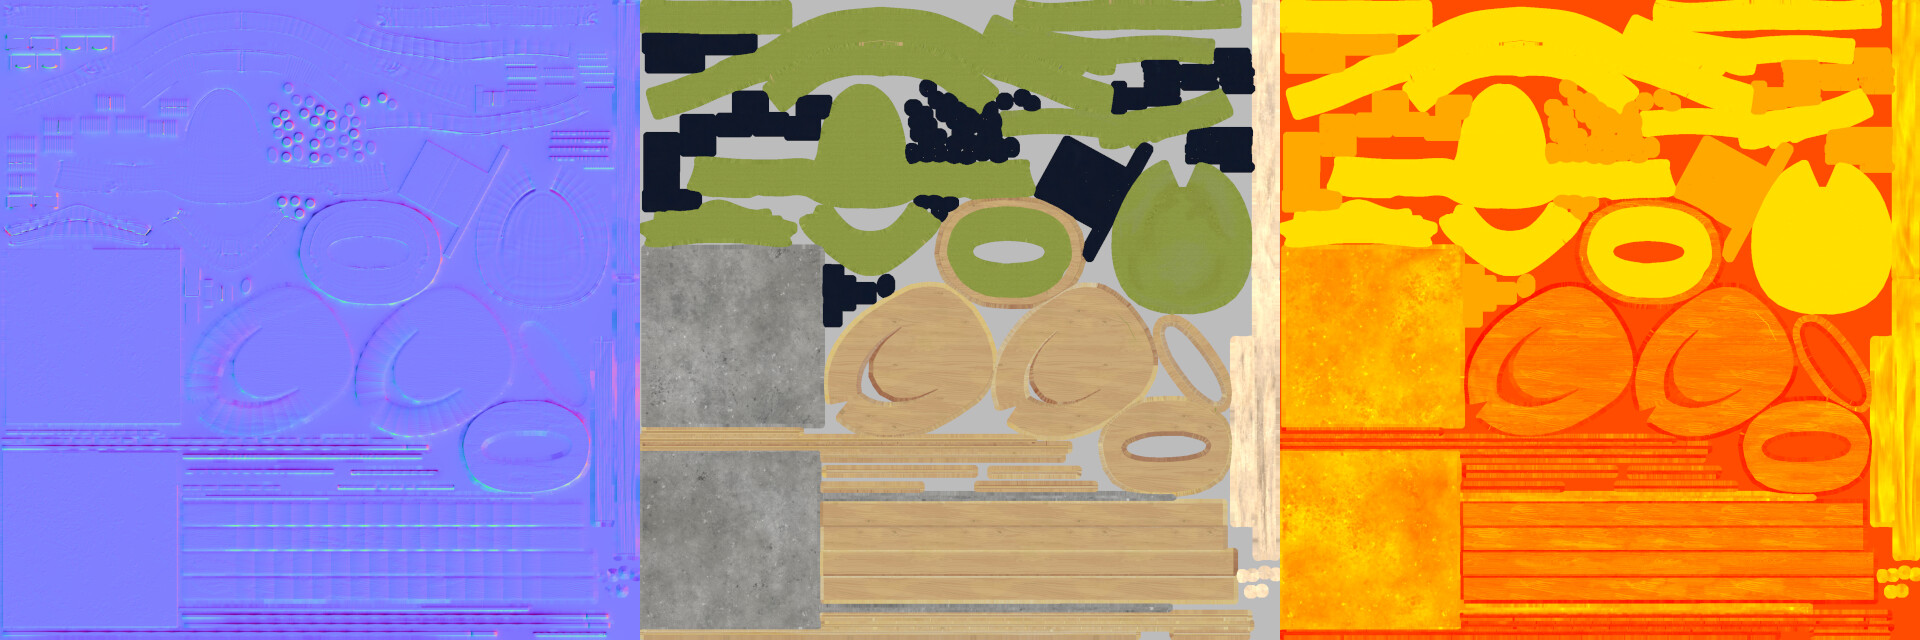 Eireni moutoussi furniture combined lp textures